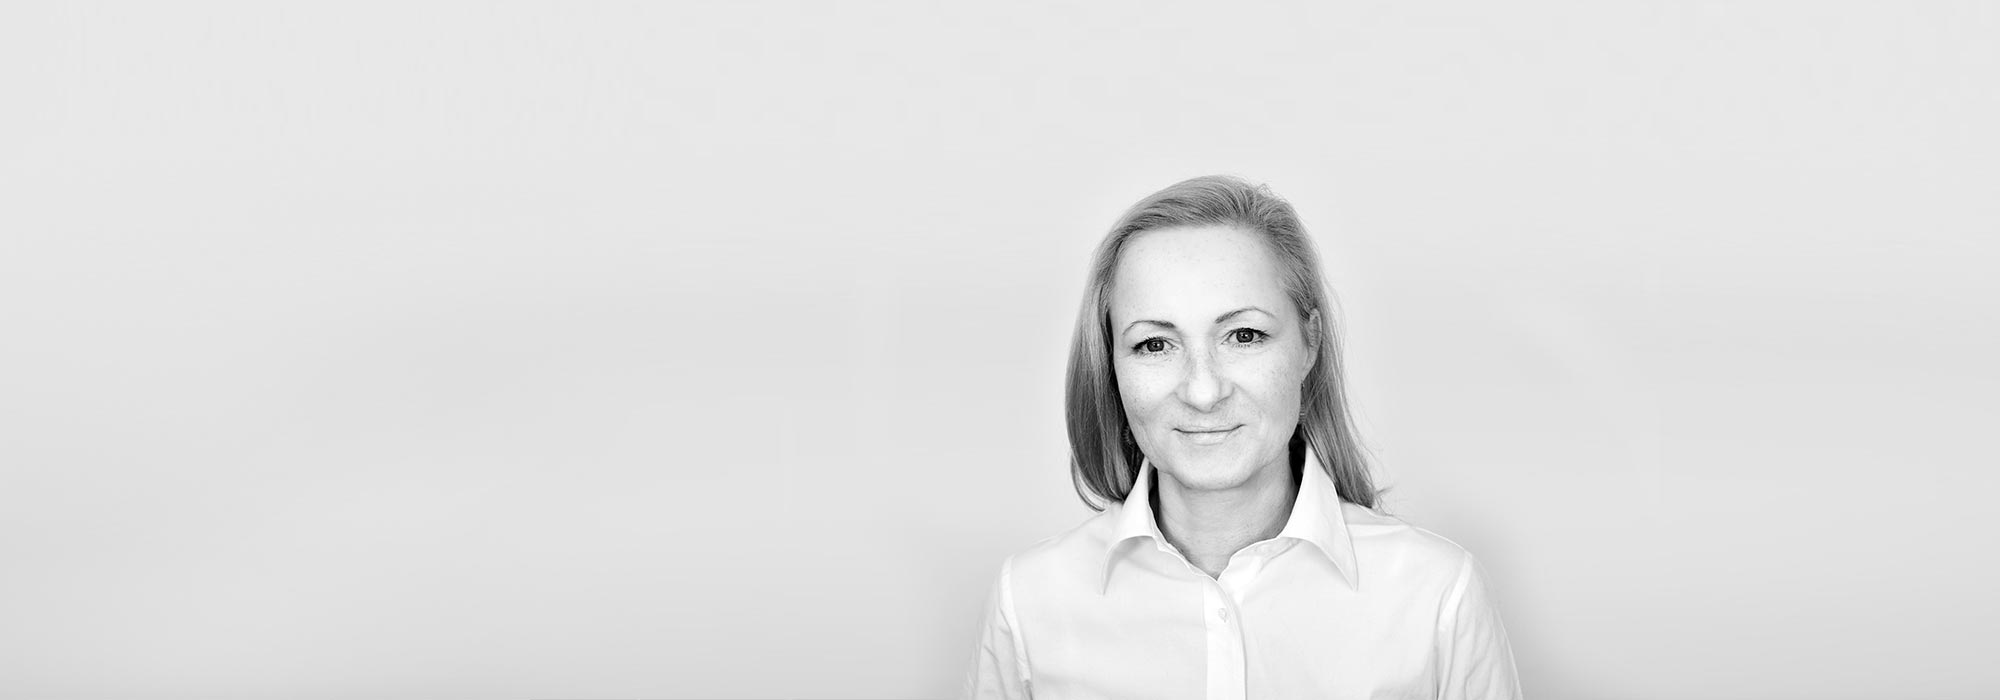 Anke Conrad-Zender